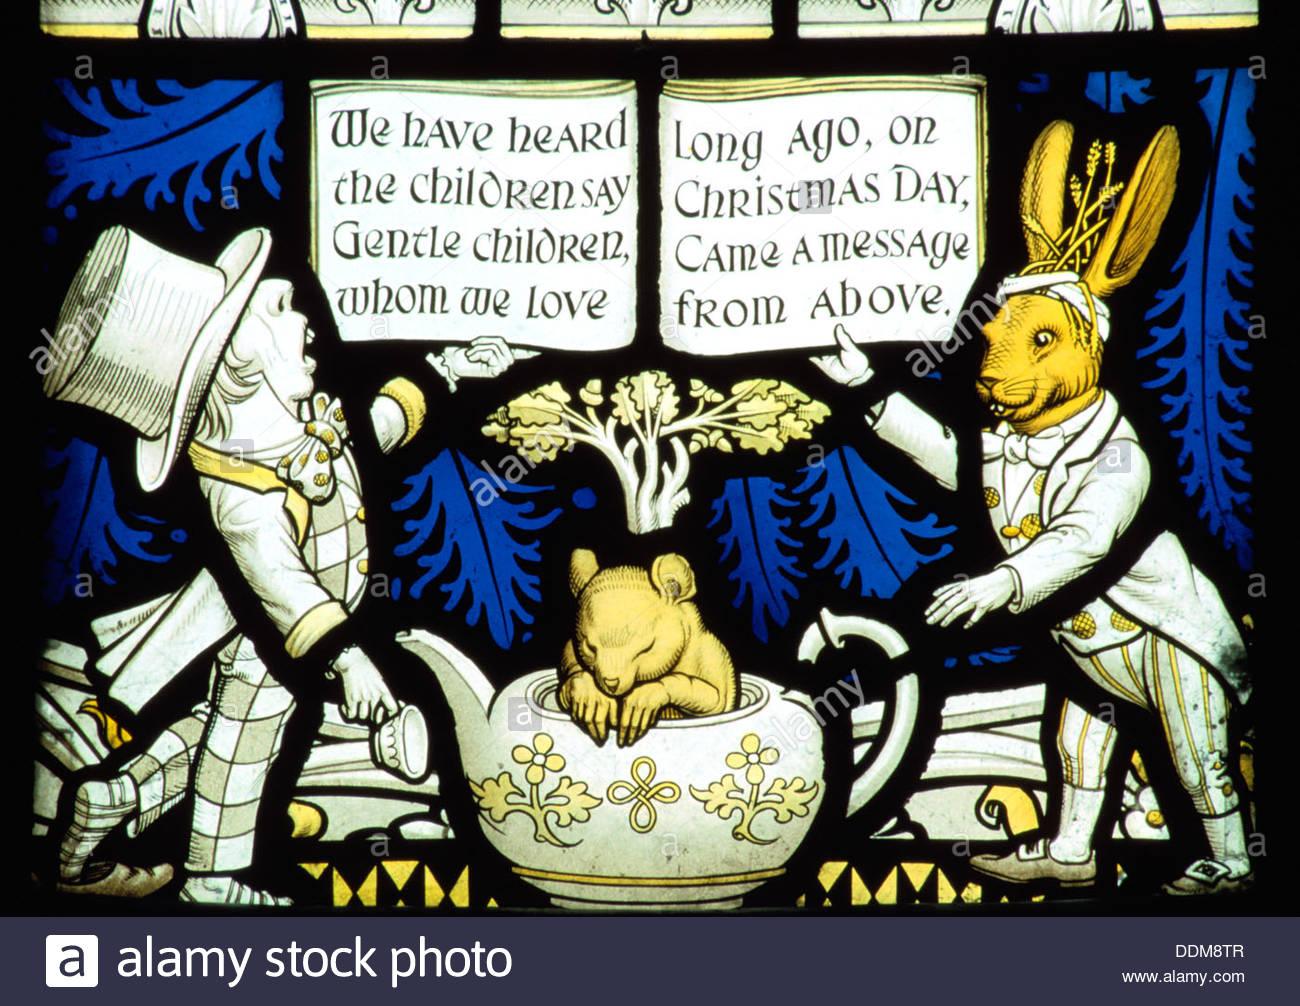 Lewis Carroll memorial window, Daresbury Church, Cheshire. Artist: Tim Smart - Stock Image